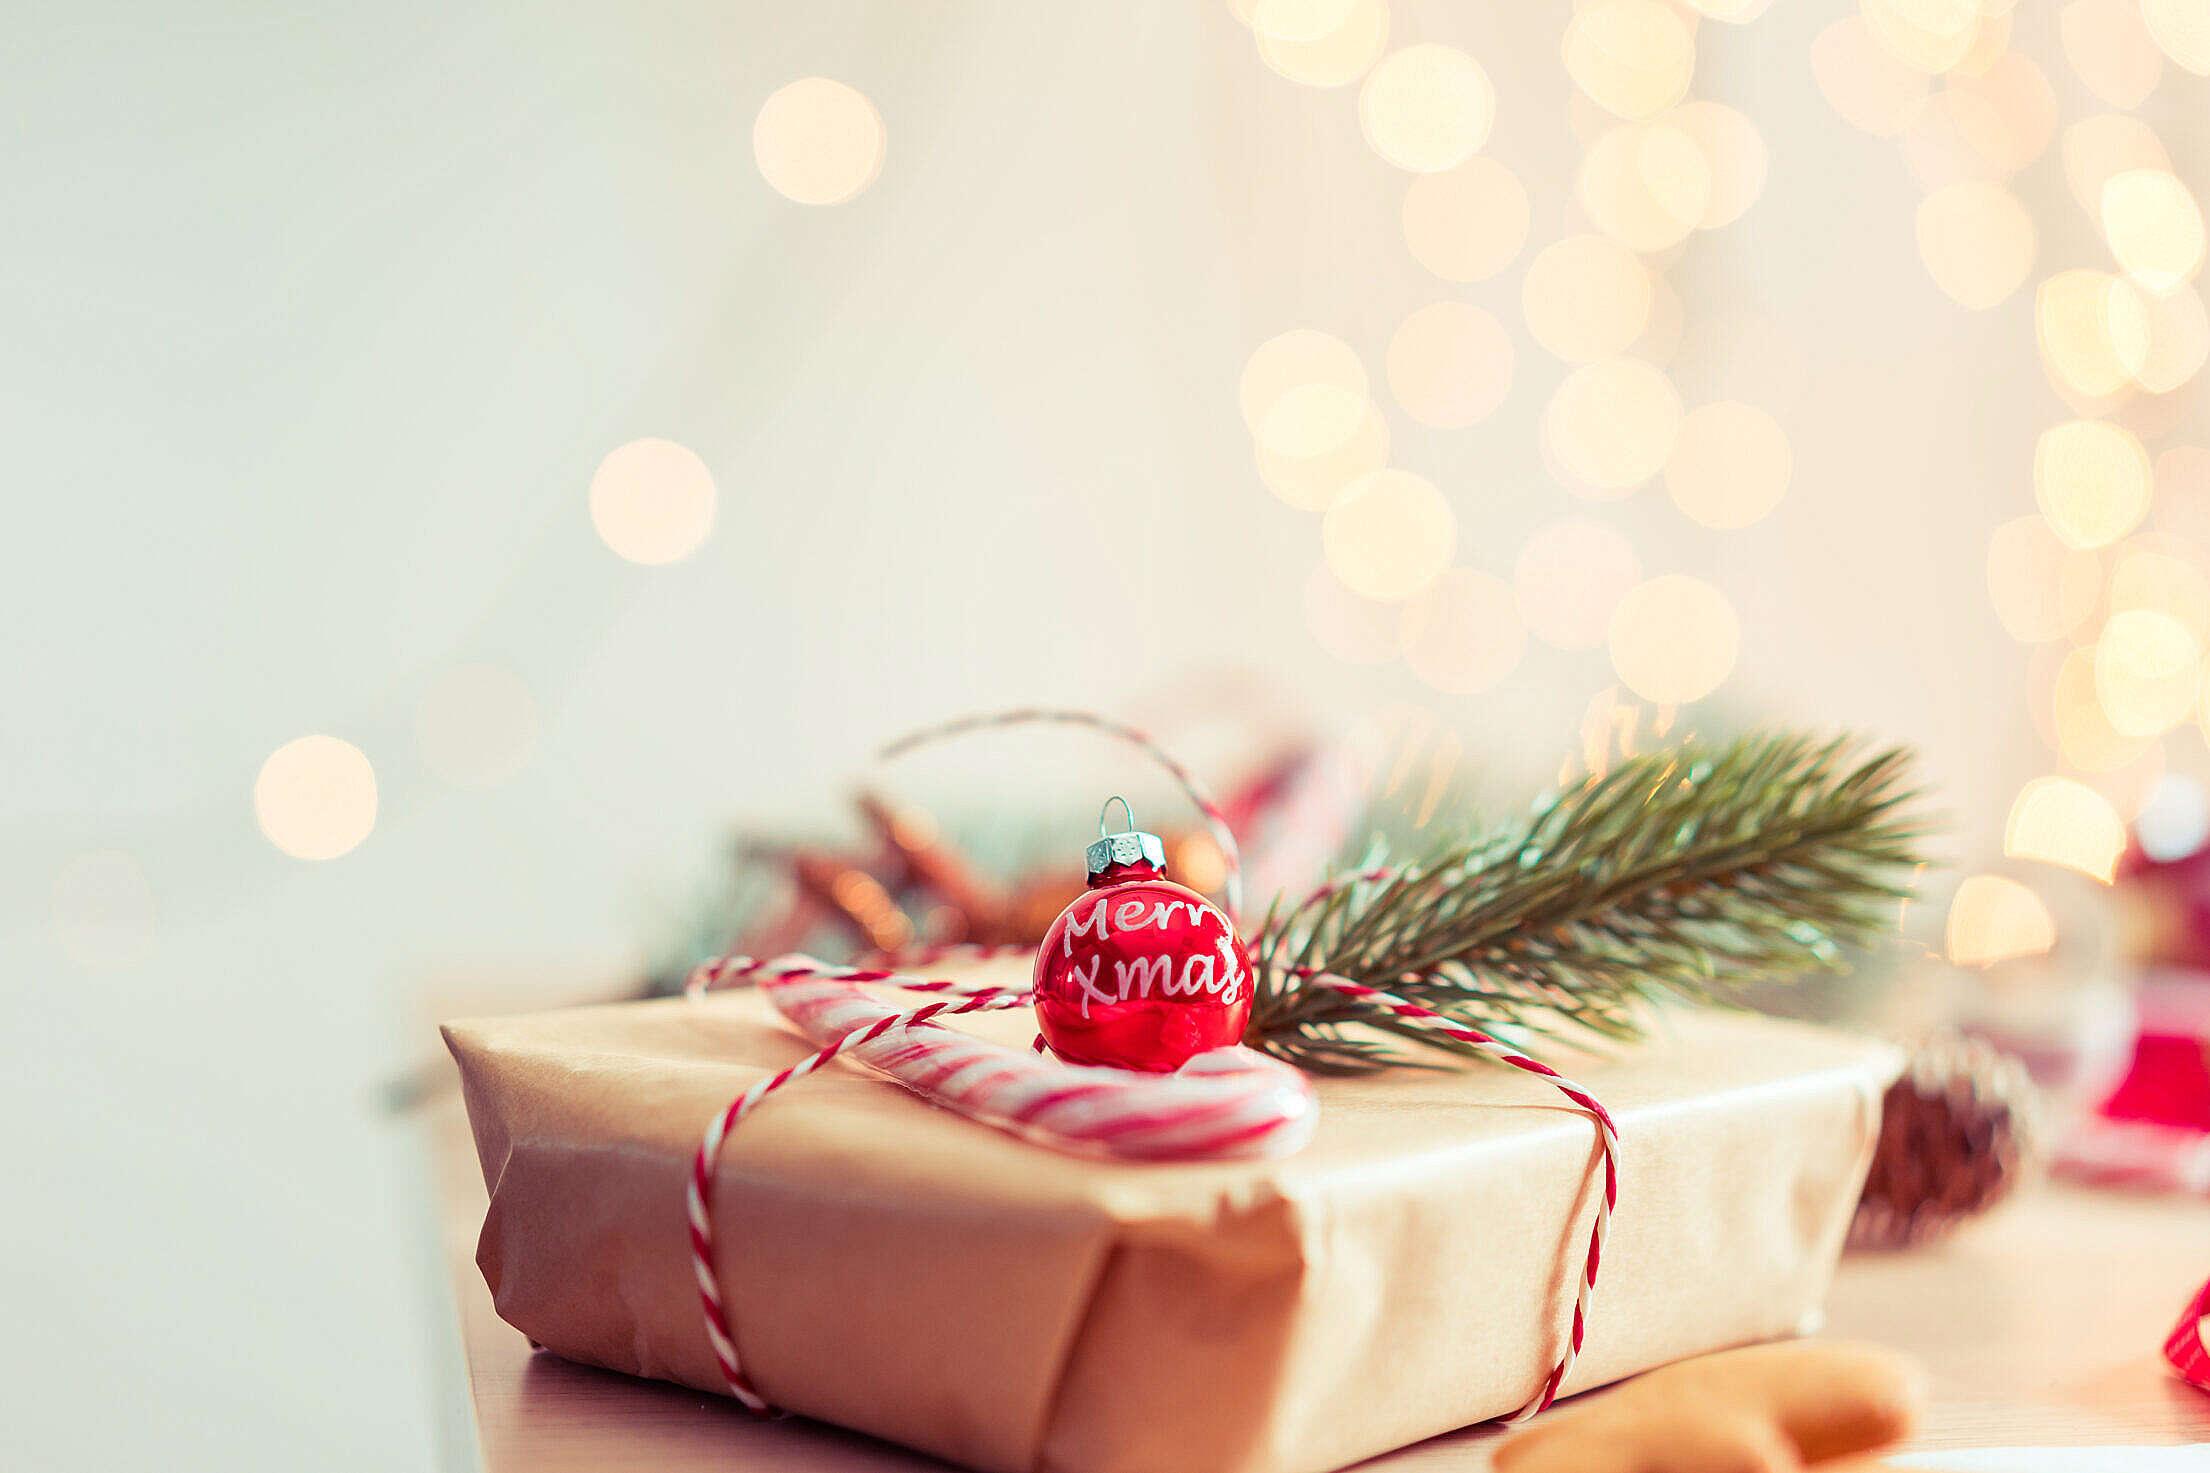 Merry Xmas Tree Decoration on Christmas Present Free Stock Photo